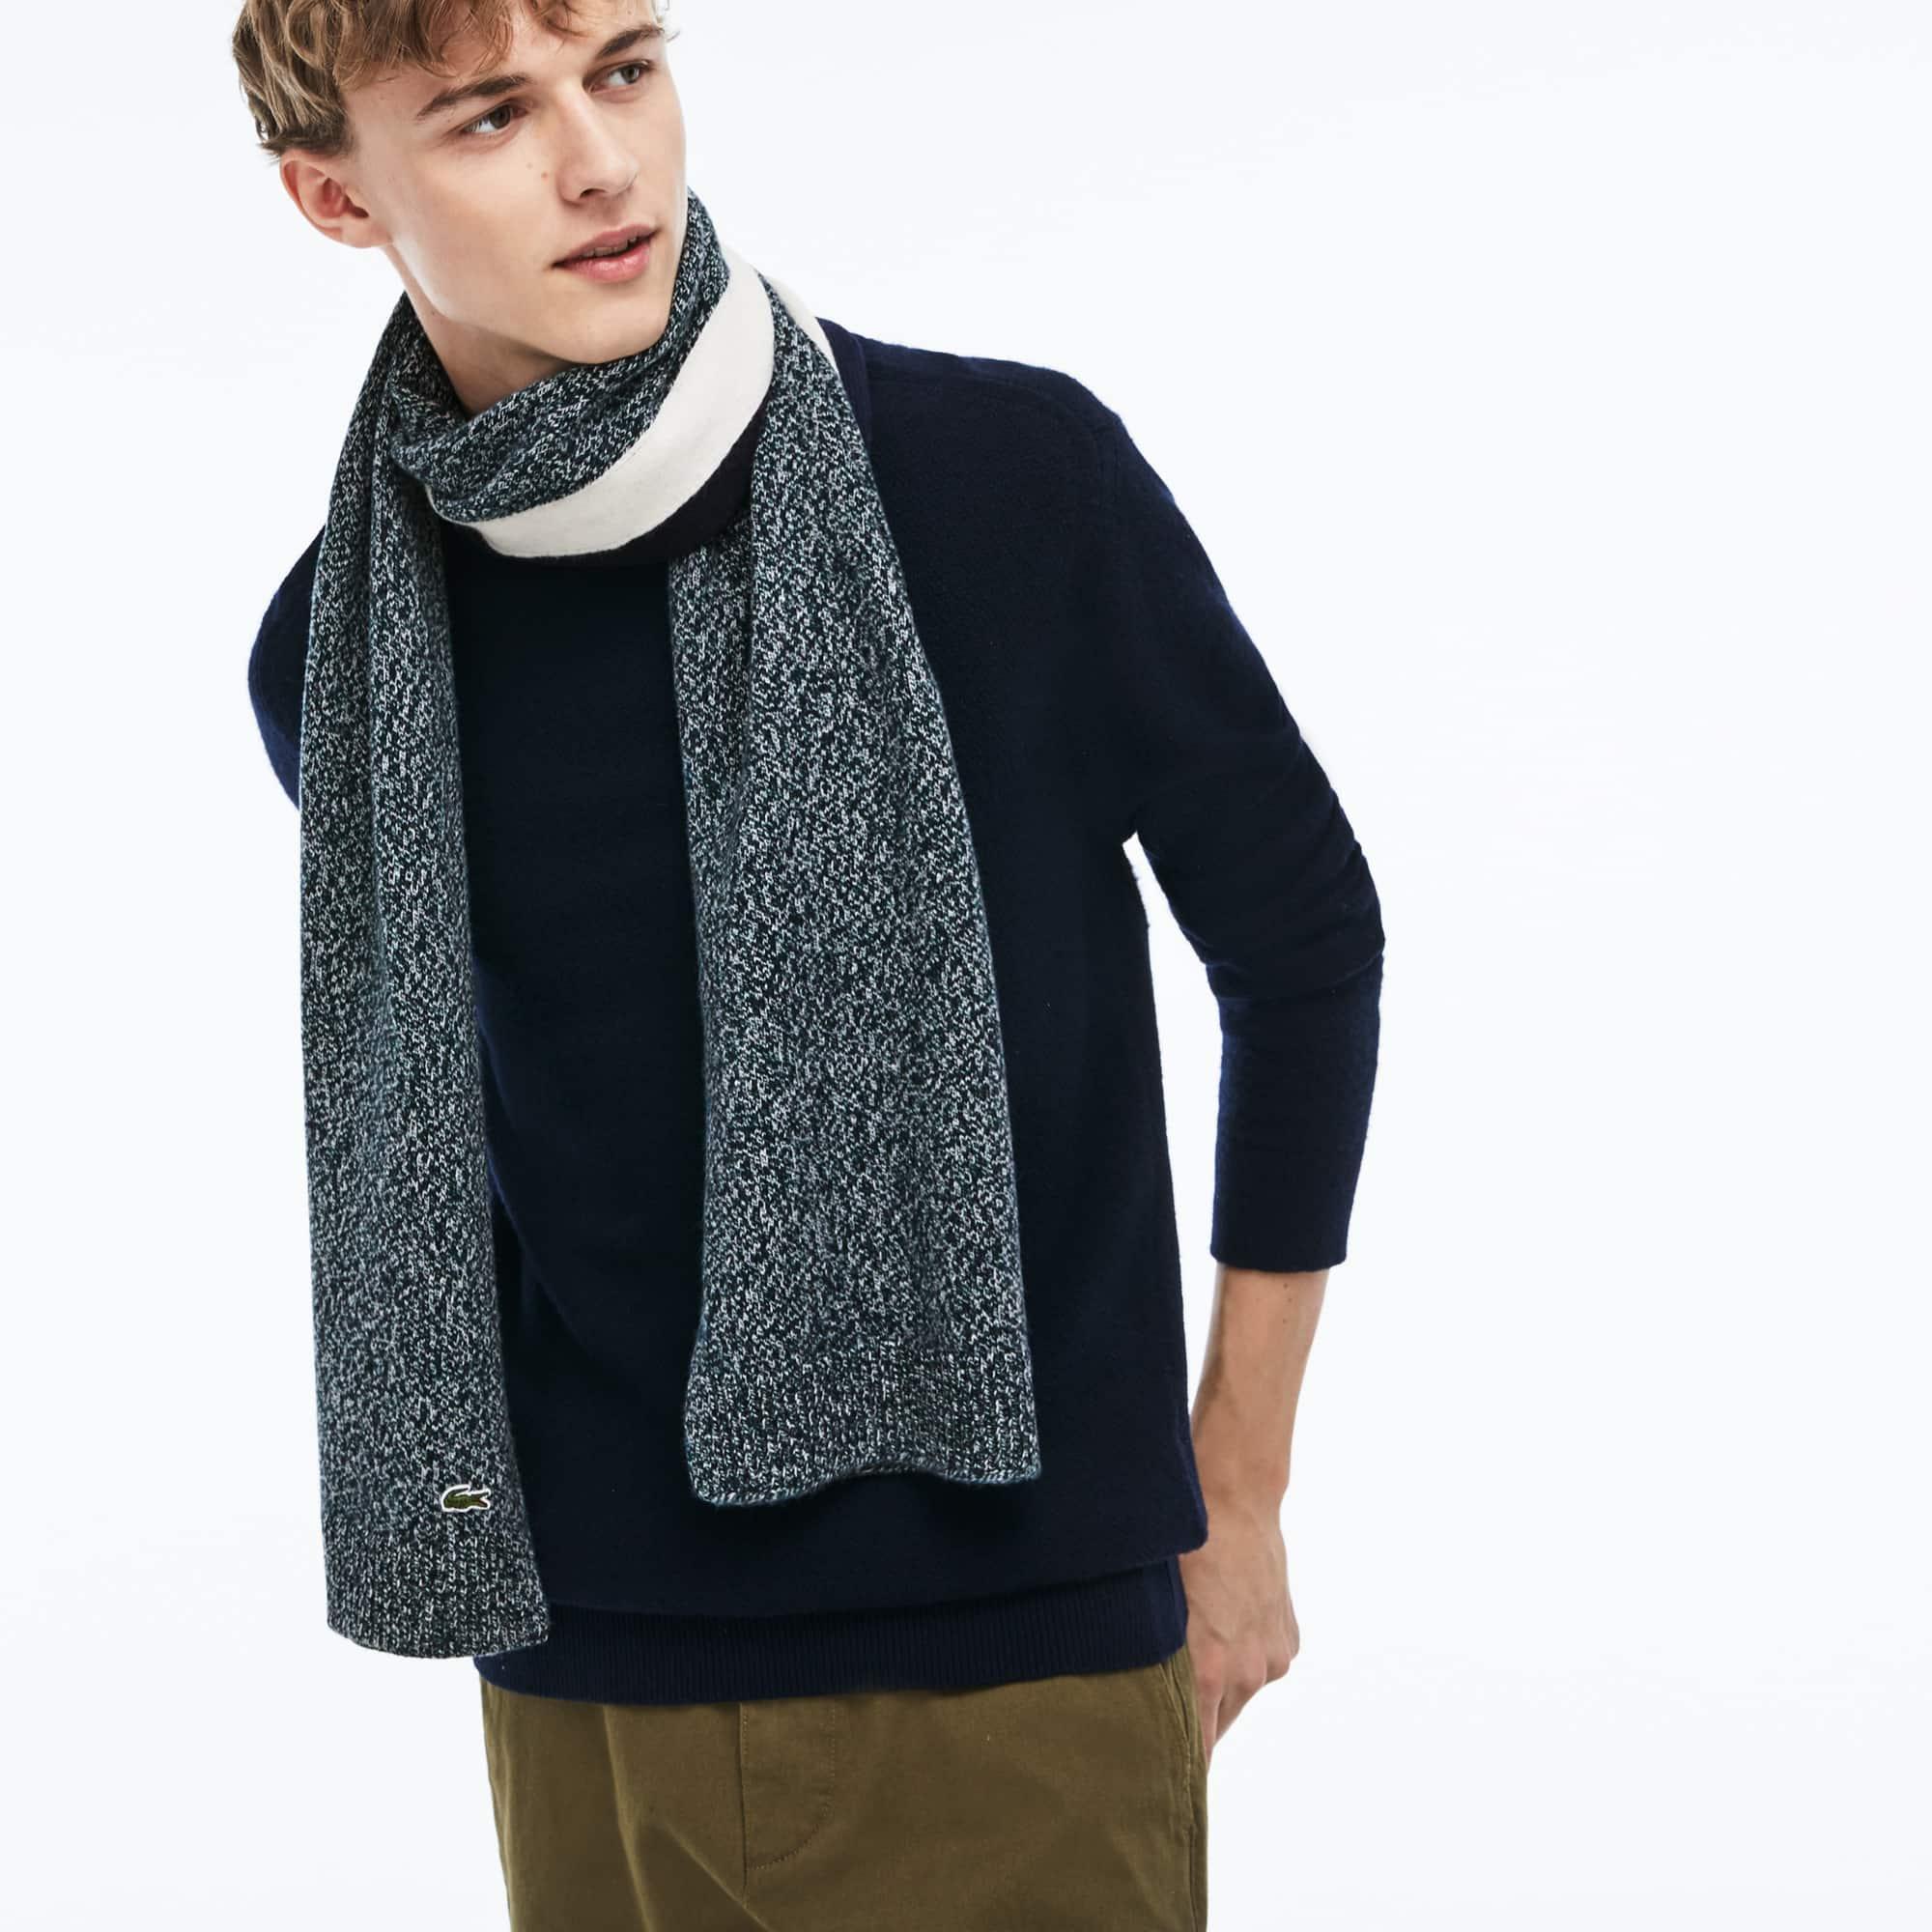 Men's Contrast Band Mouliné Wool Jersey Scarf